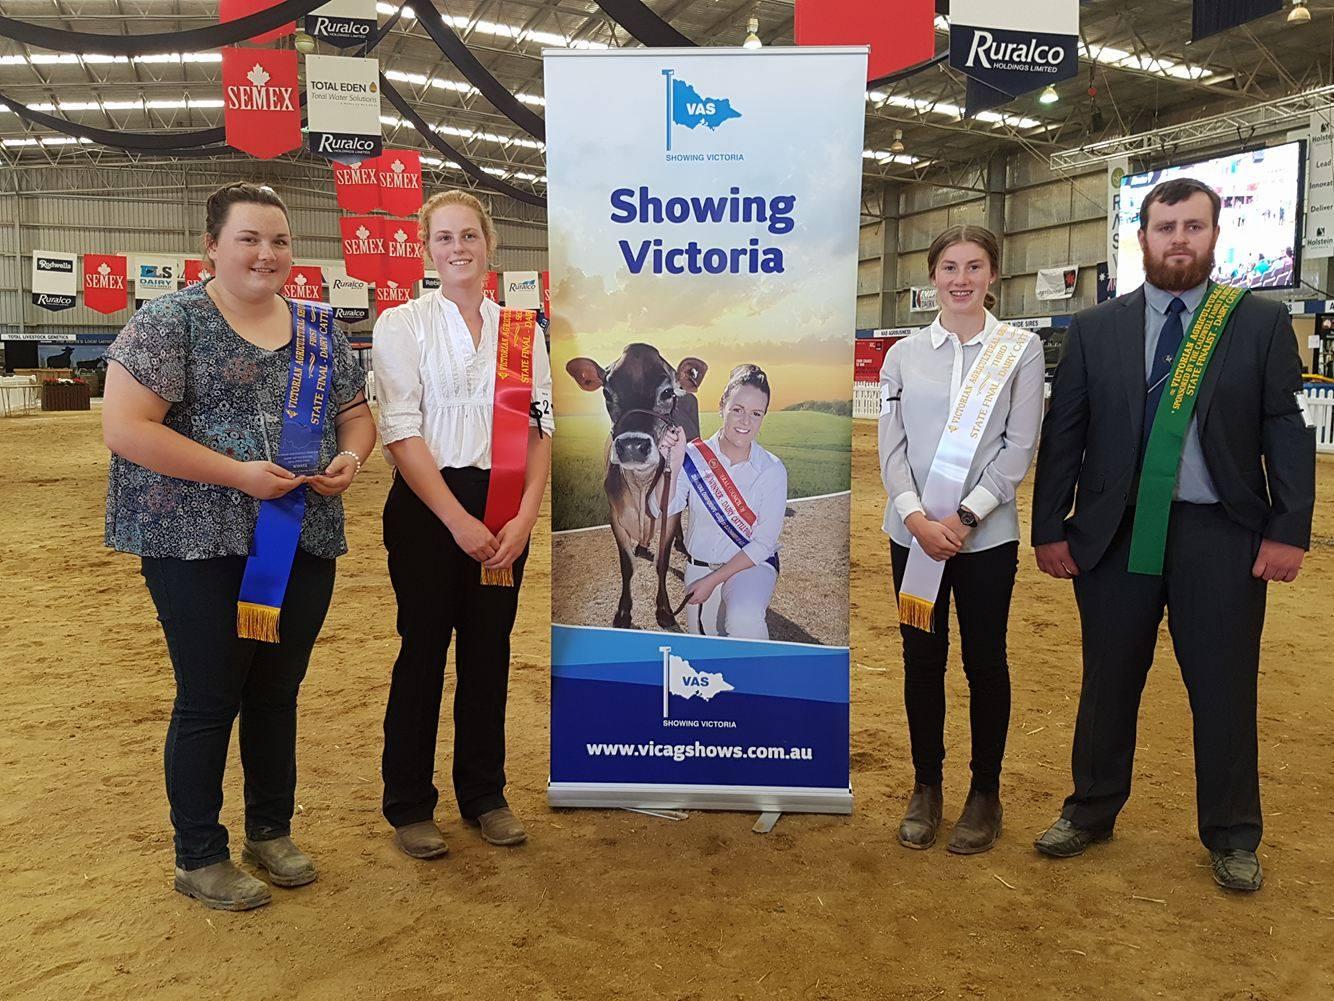 L - R Cally o'shannassy, tamara loughridge, Rachel Dickson & karl munden. winners of the state final of the vas ltd dairy judging competition.